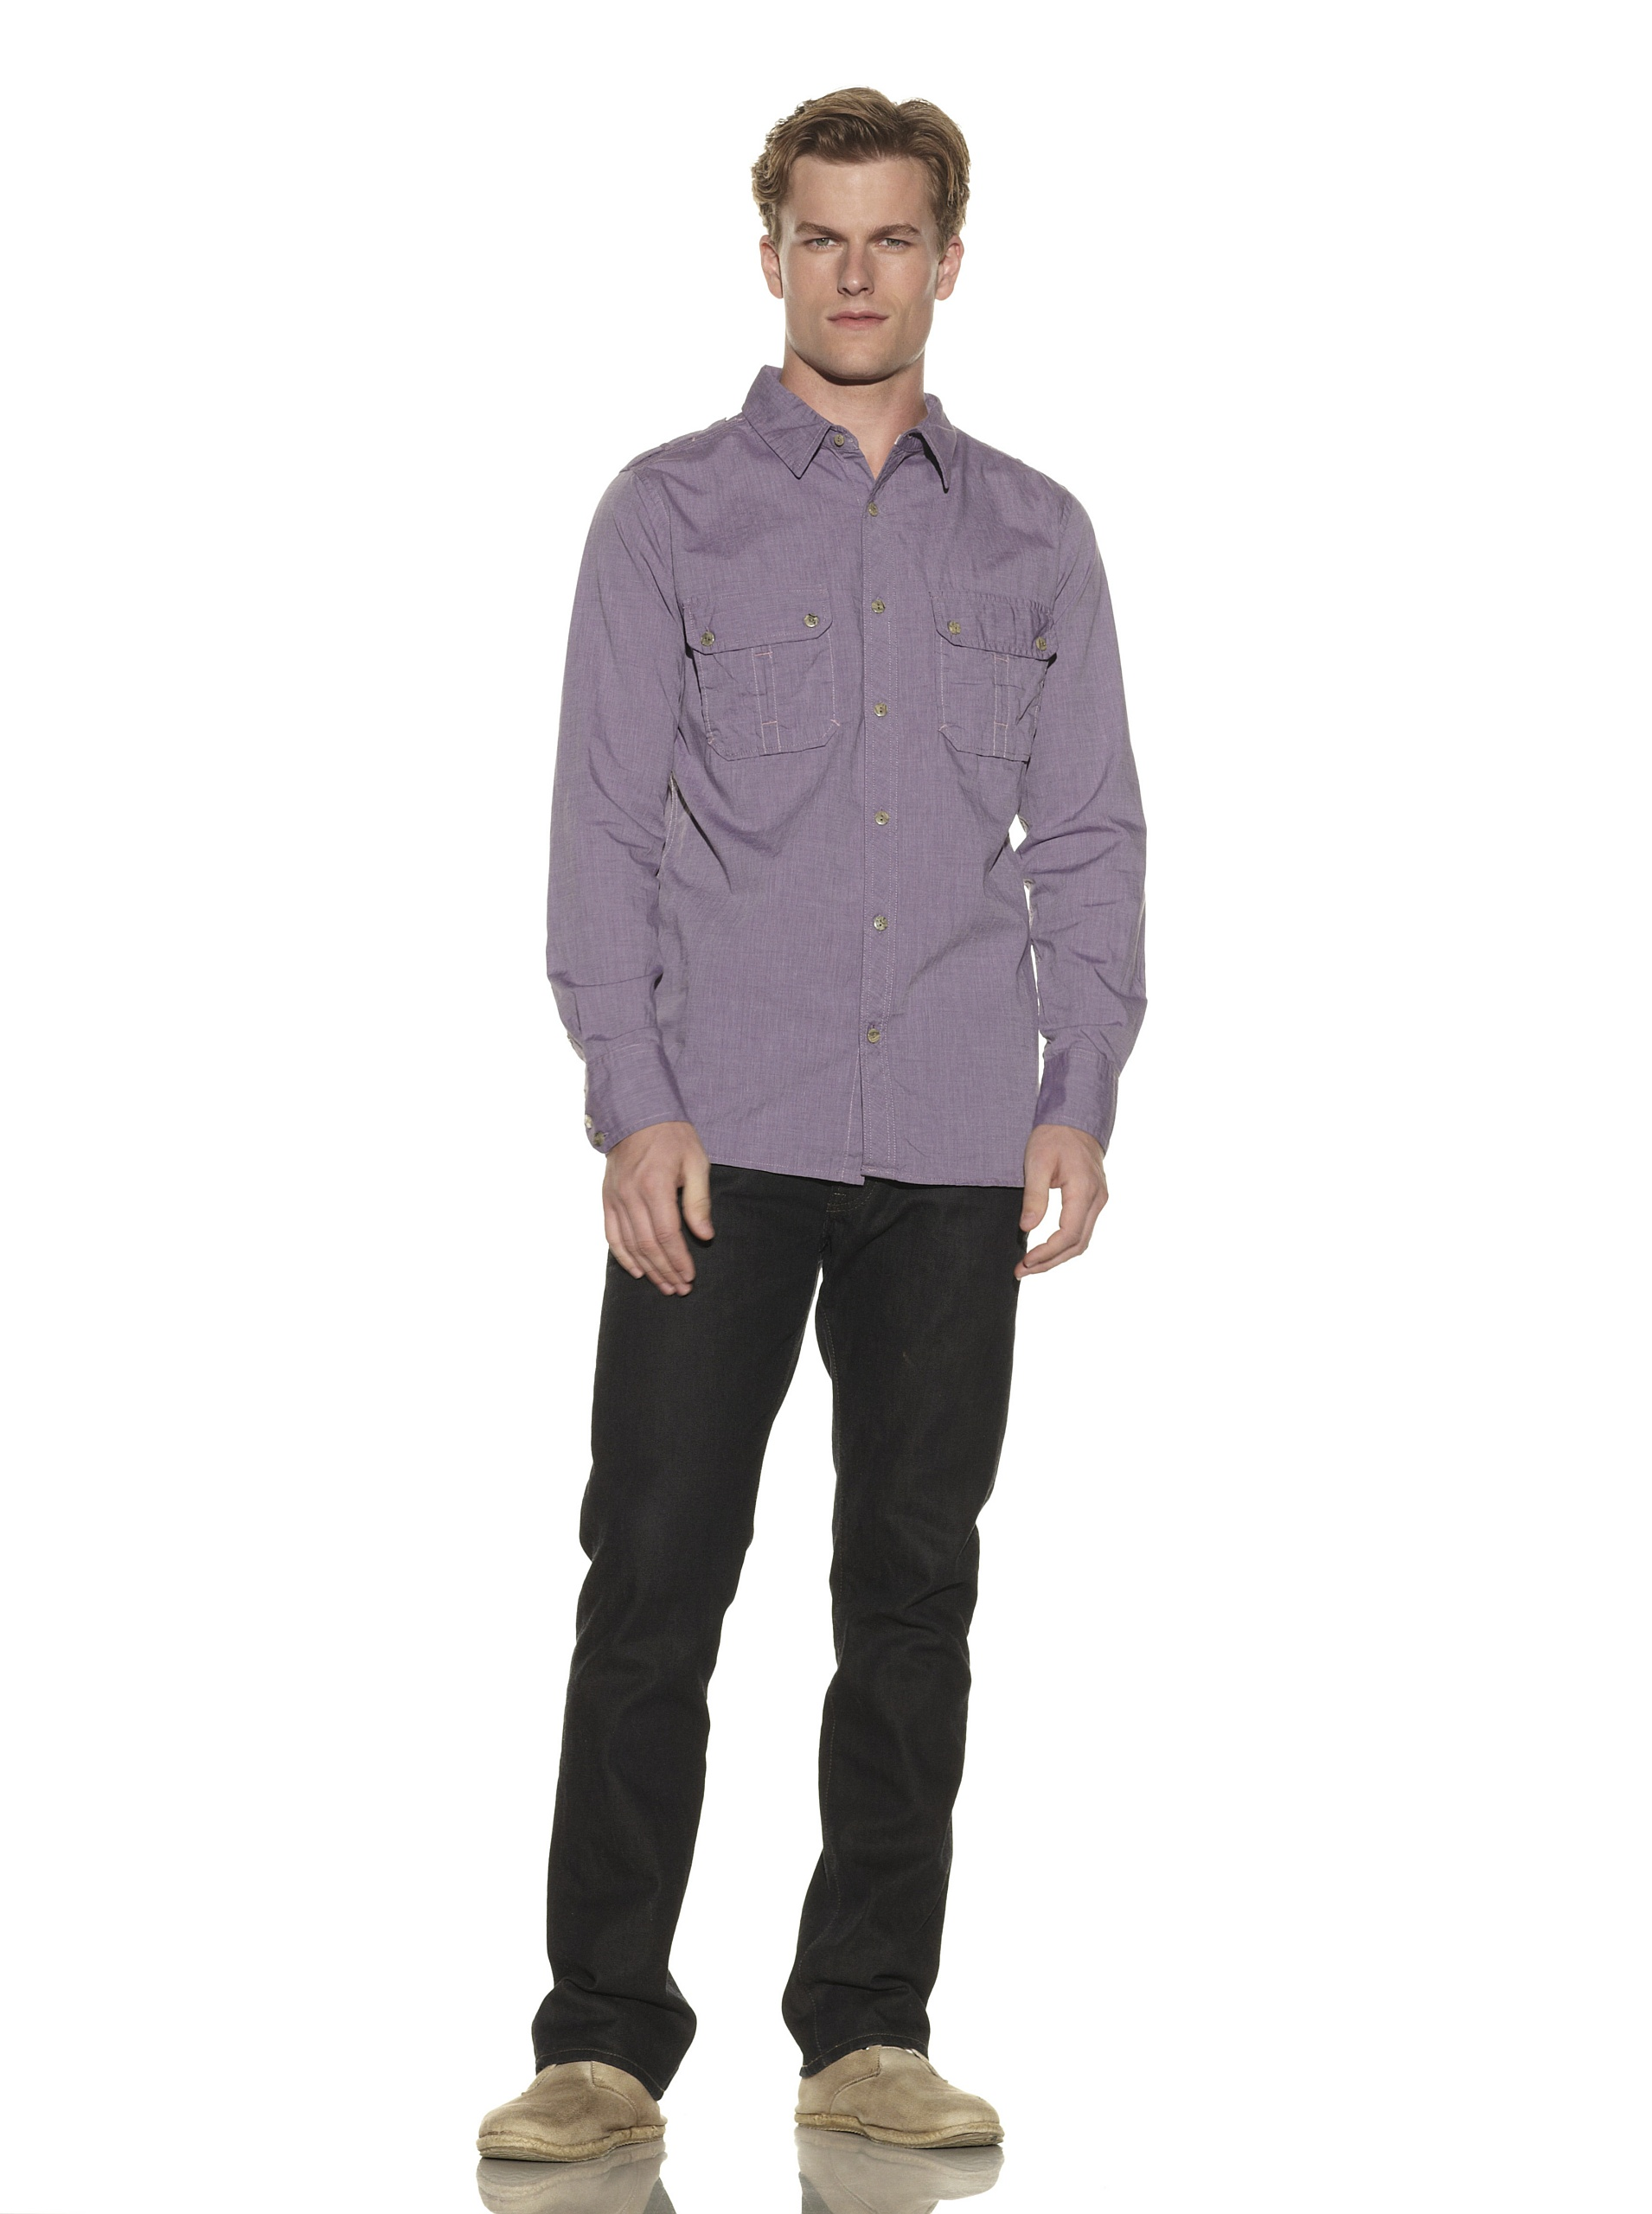 nüco Men's Long Sleeve Woven Chambray Shirt (eggplant)